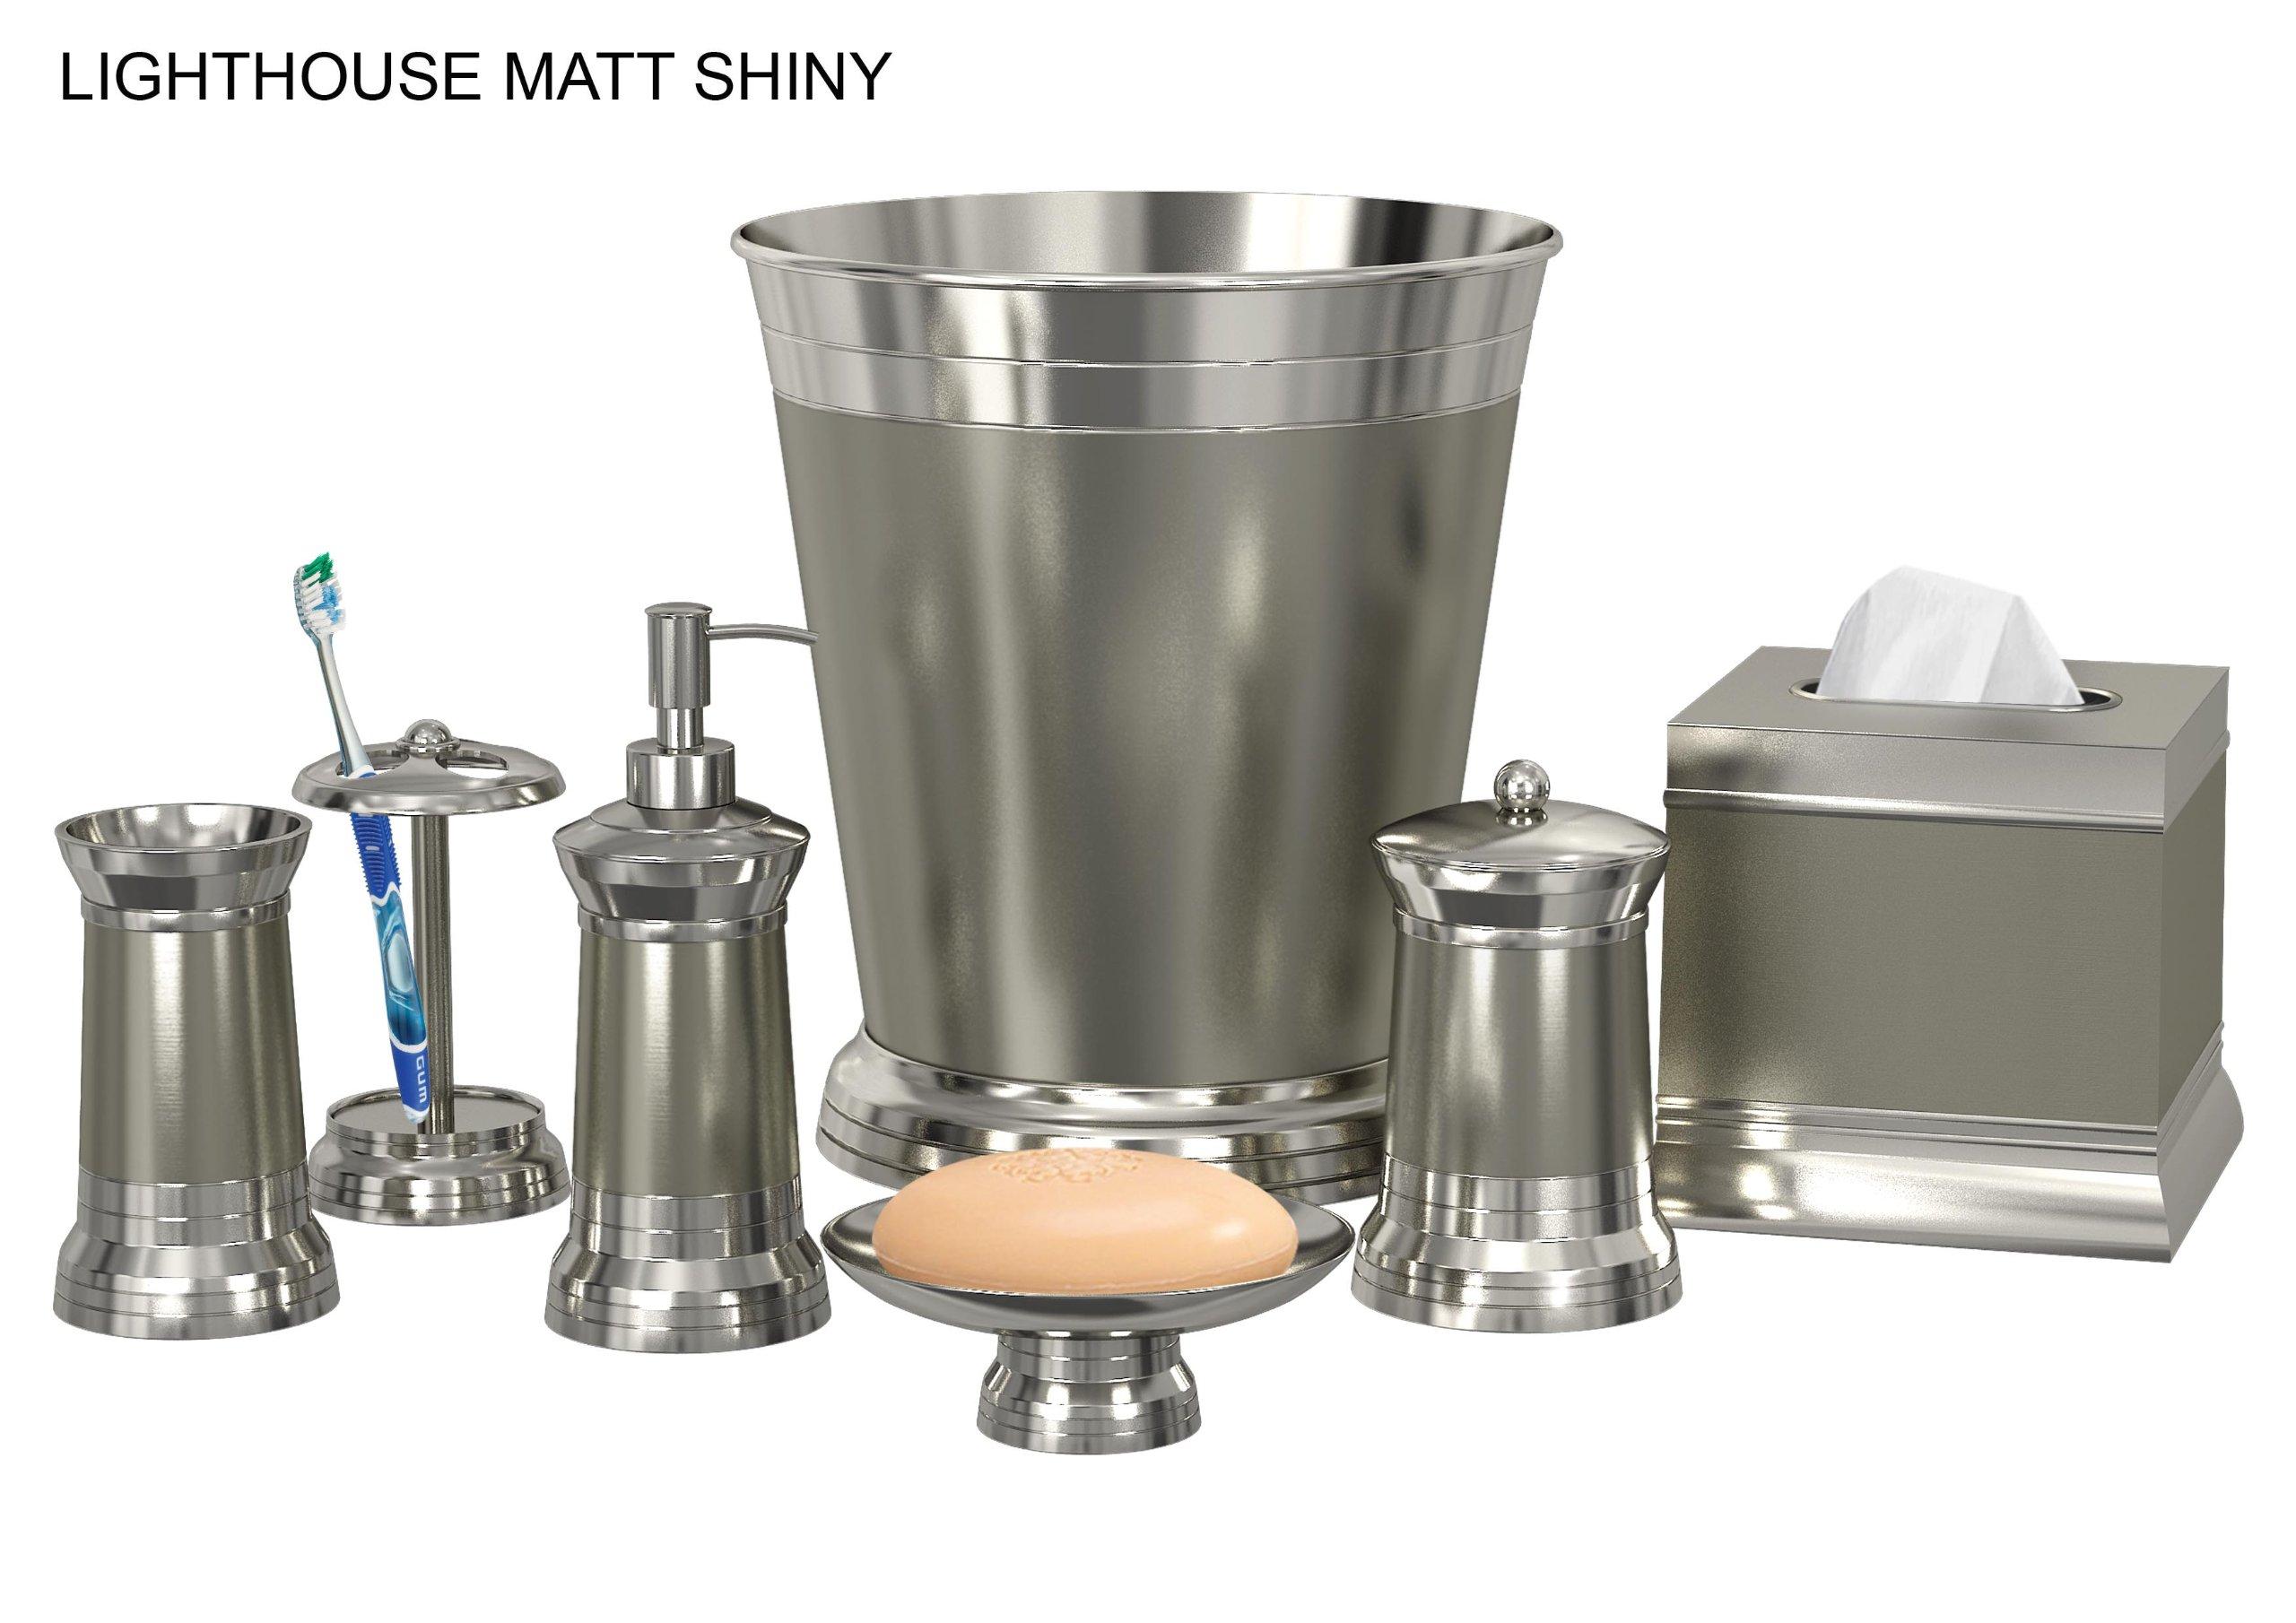 nu steel Lighthouse Matt Shiny 8-Piece Bath Accessories Set